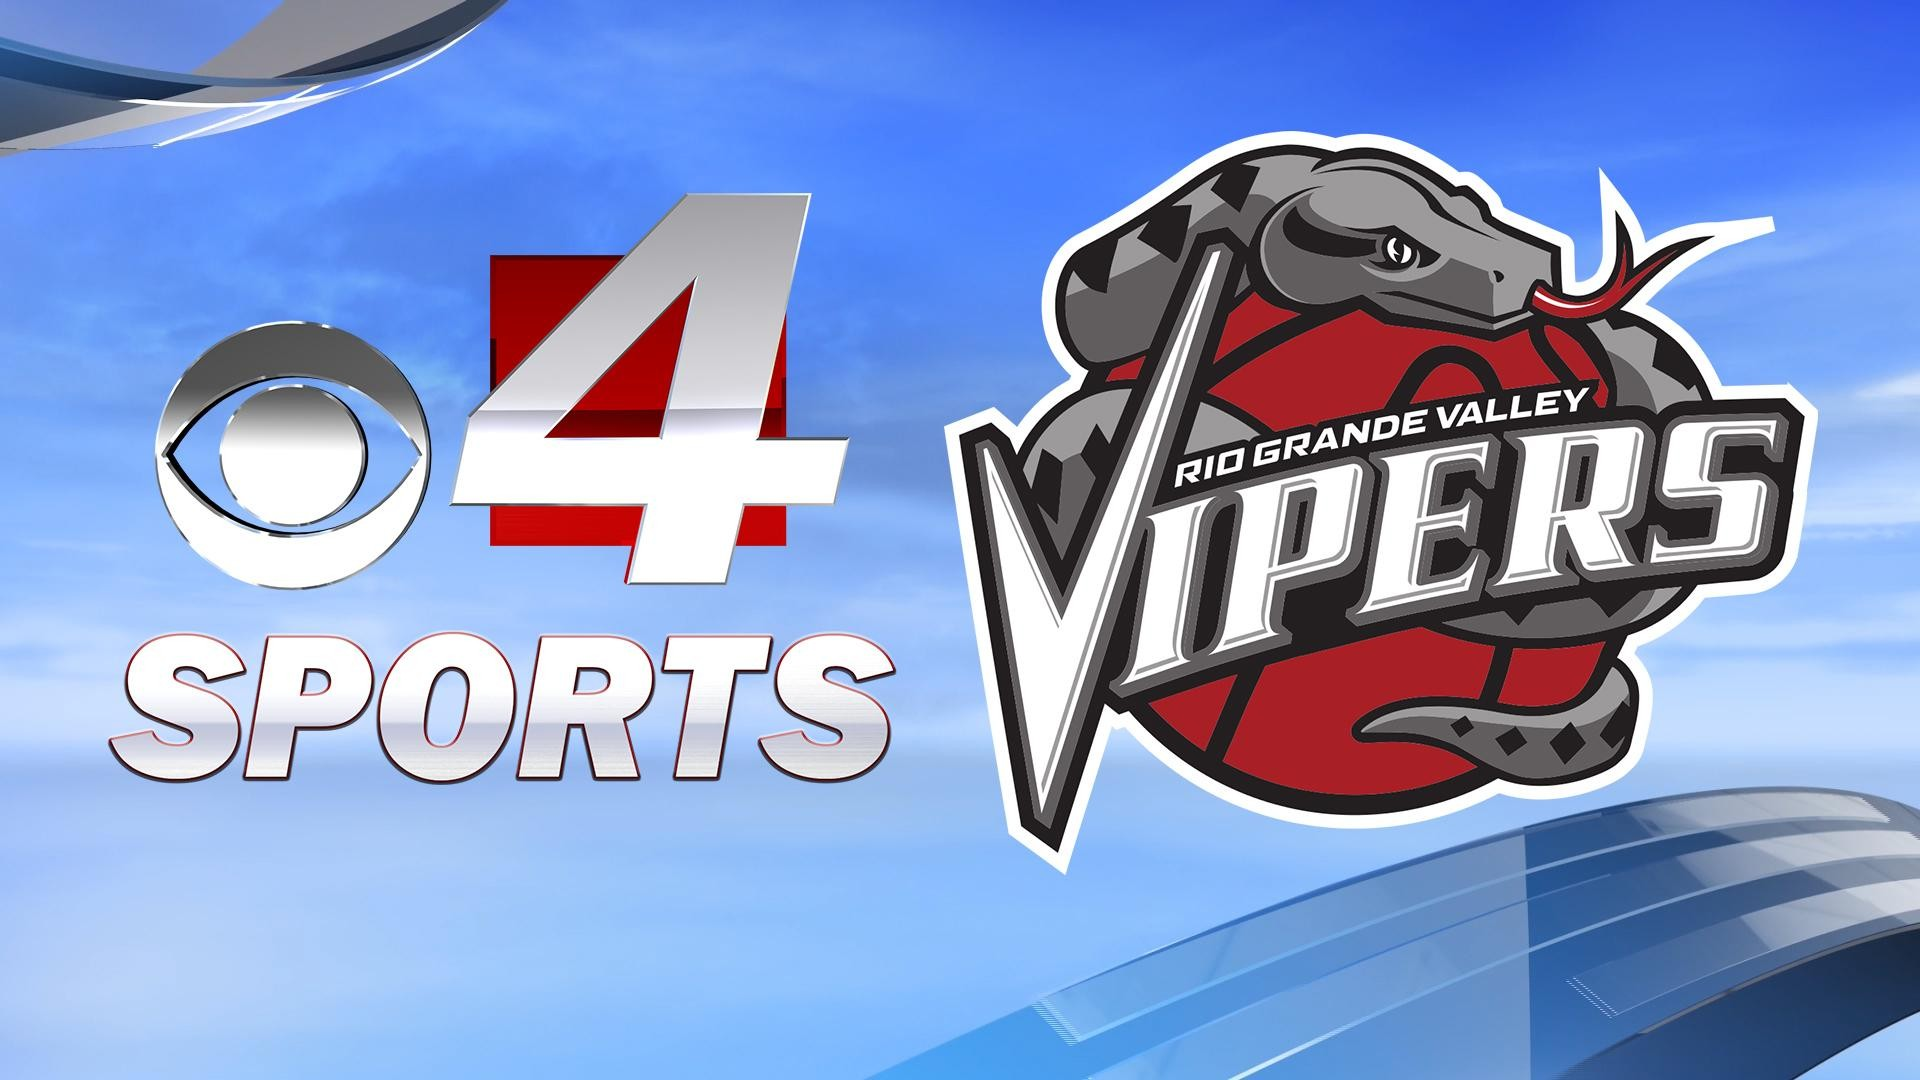 RGV Vipers CBS4 Sports Web.jpg